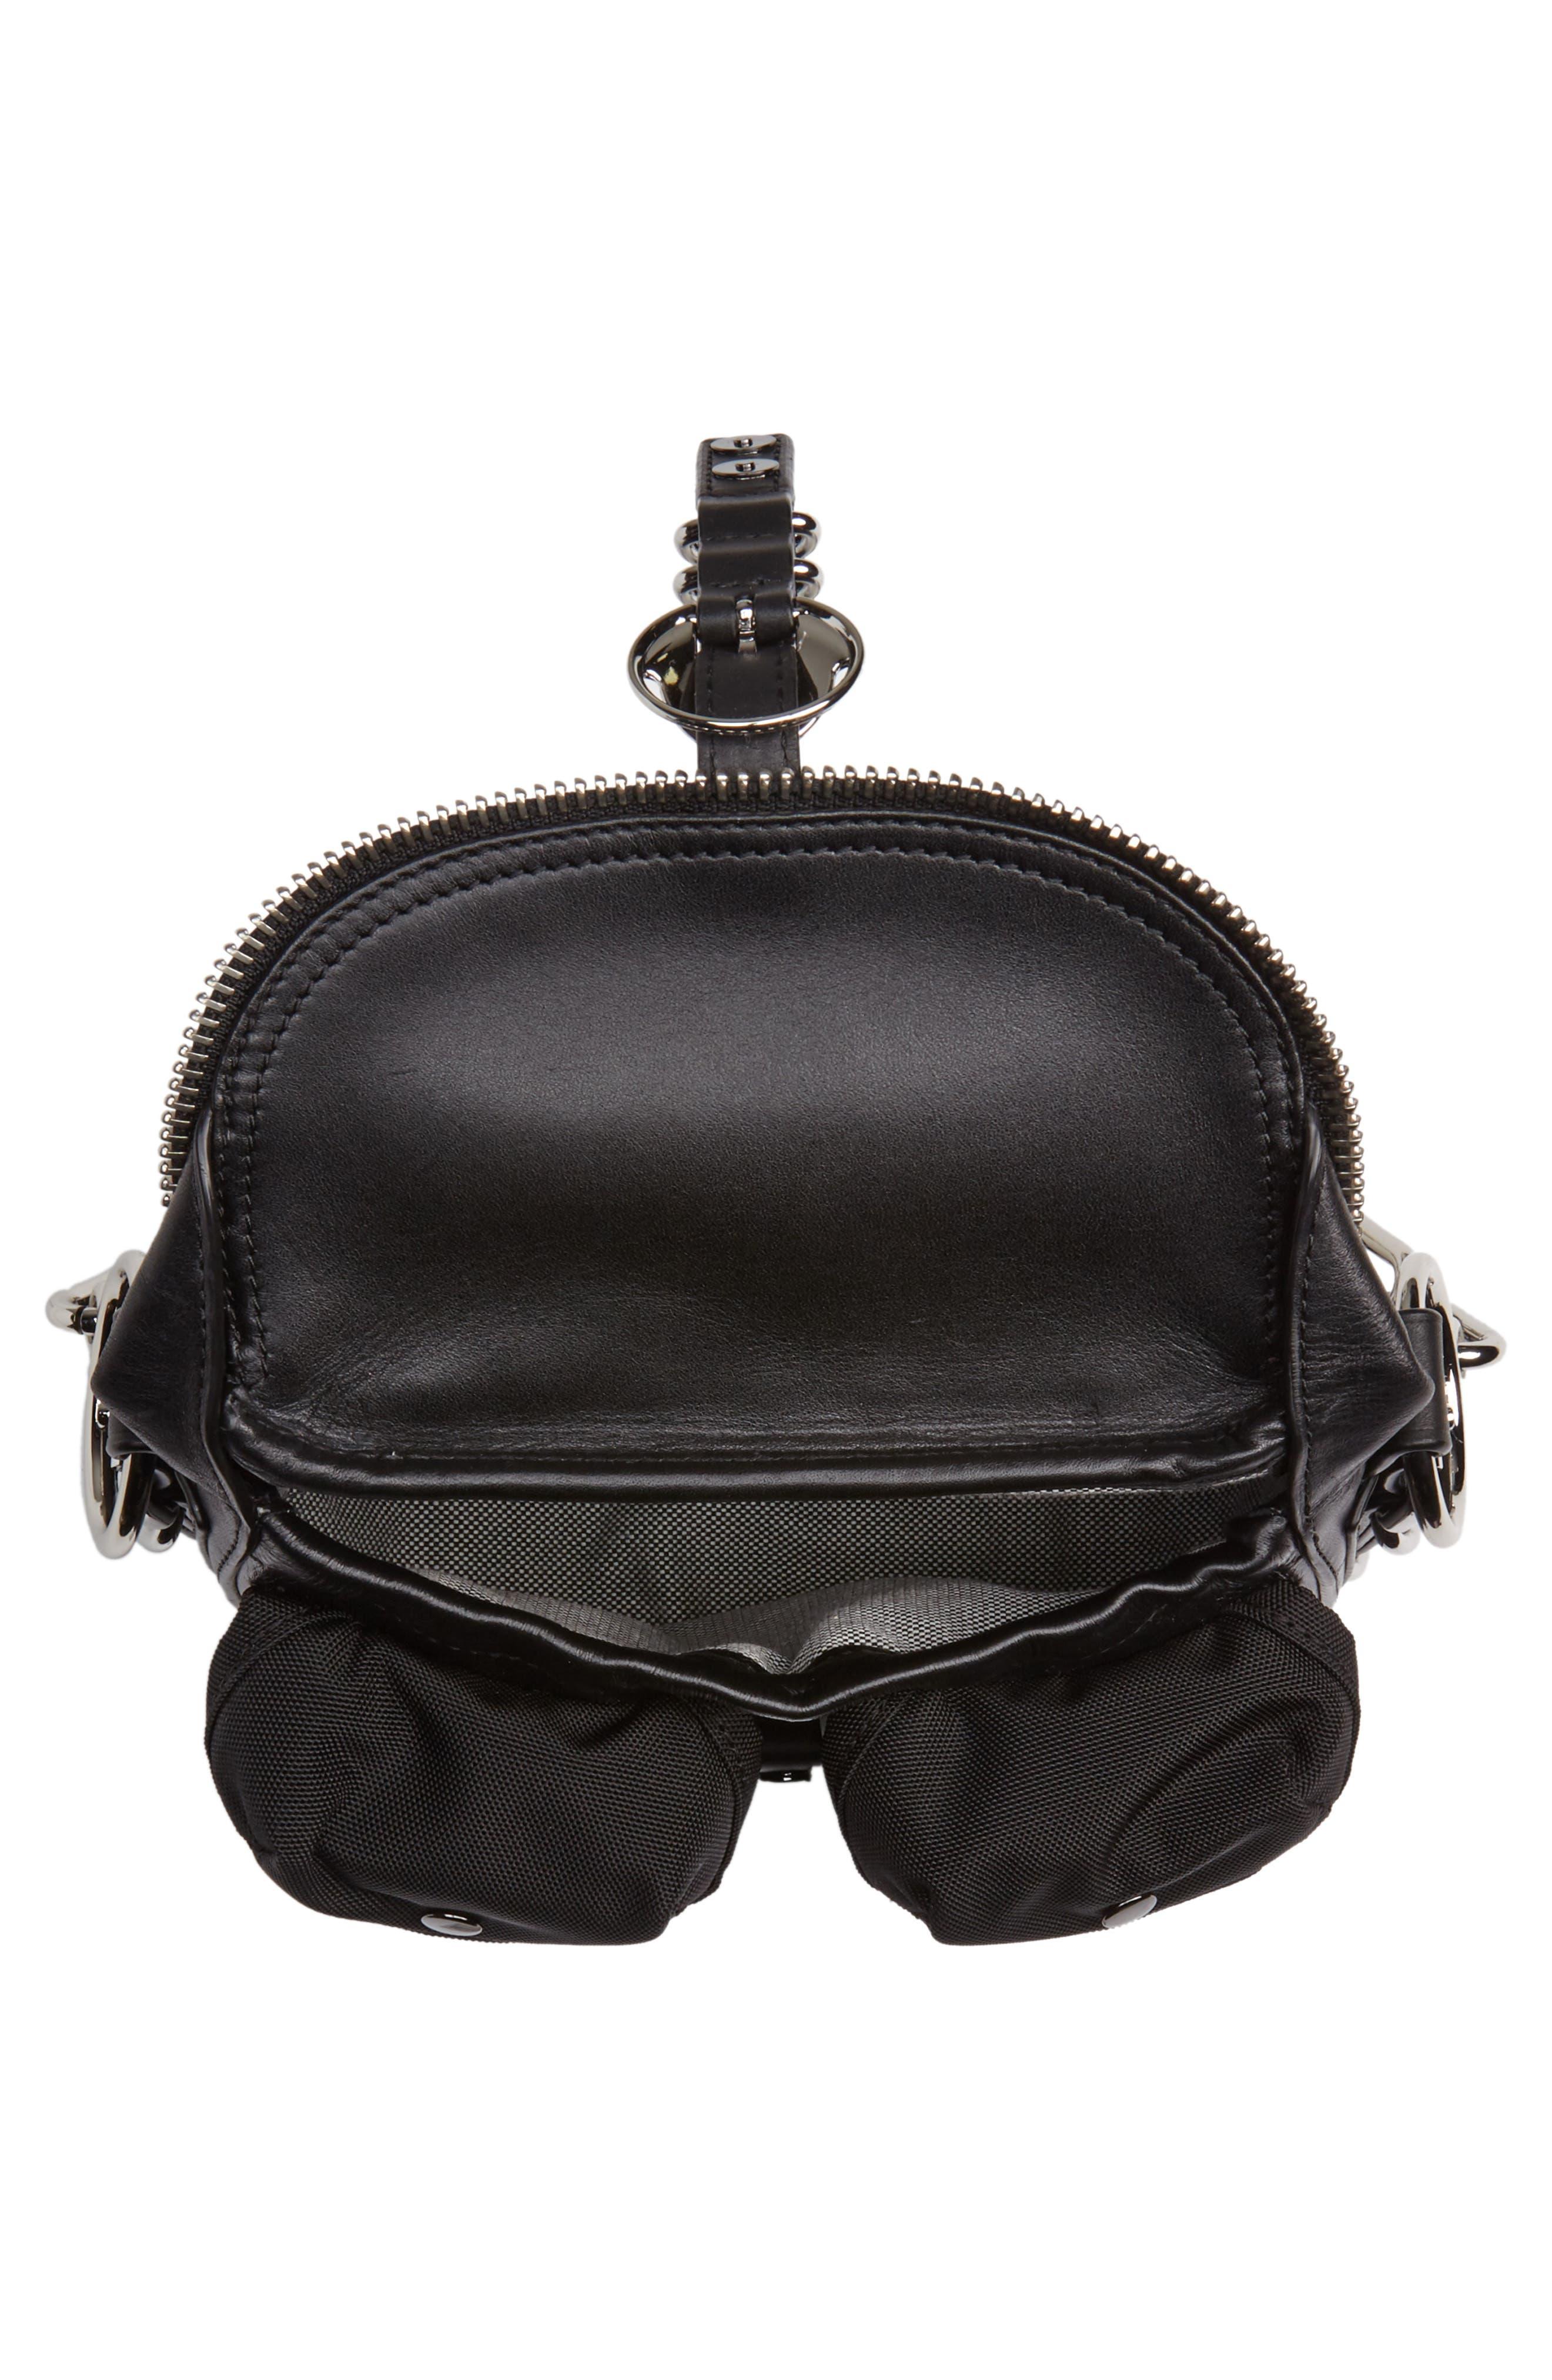 Rove Mixed Media Crossbody Bag,                             Alternate thumbnail 4, color,                             BLACK